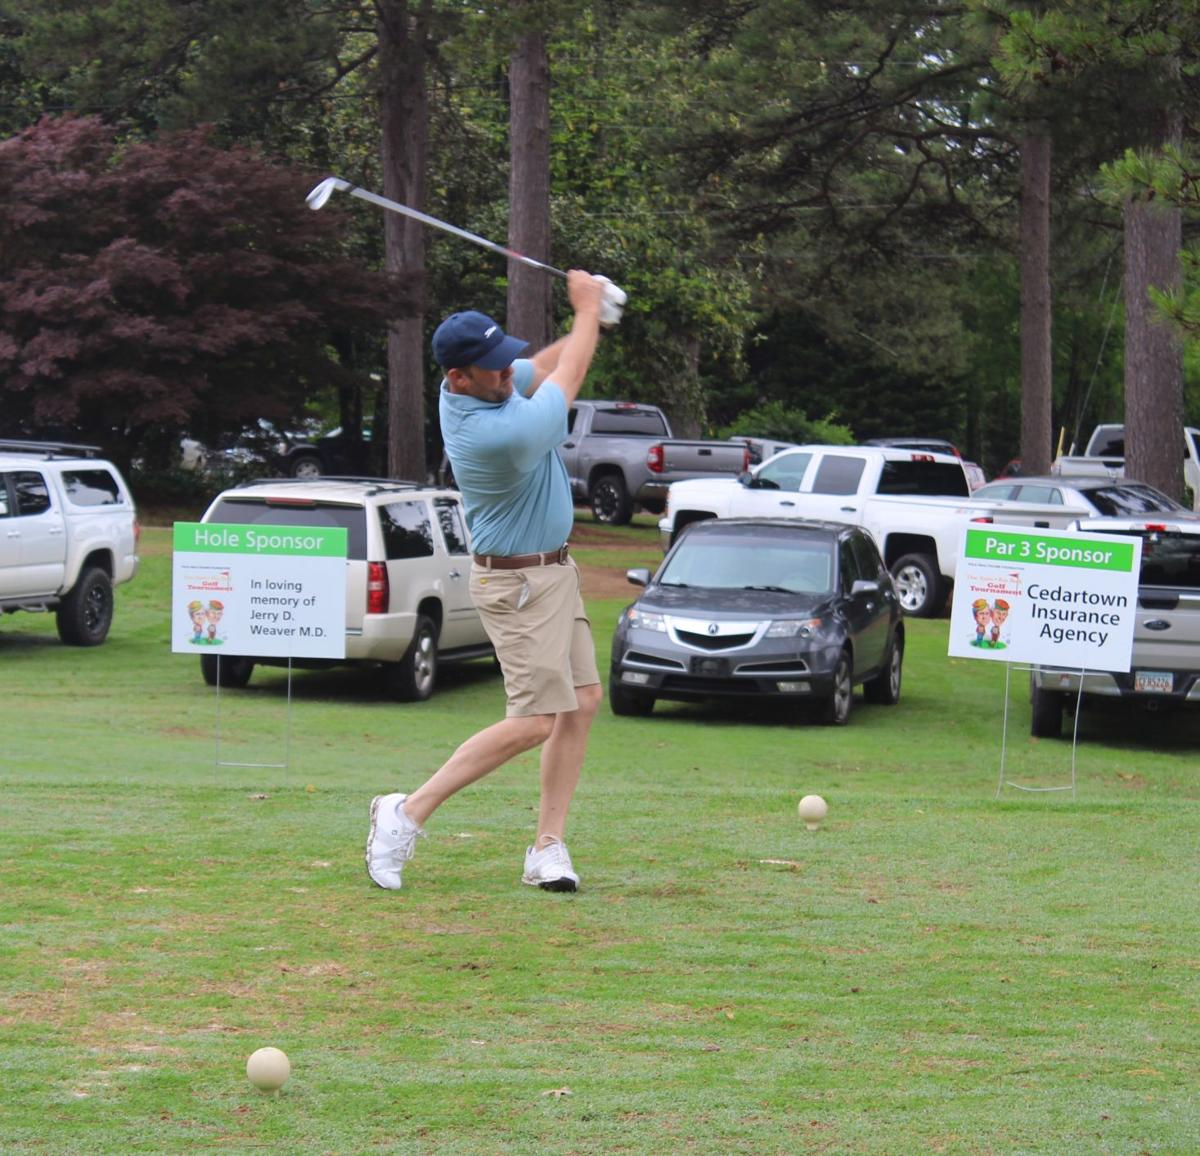 Ayers-Beck Celebrity Golf Tournament 2019